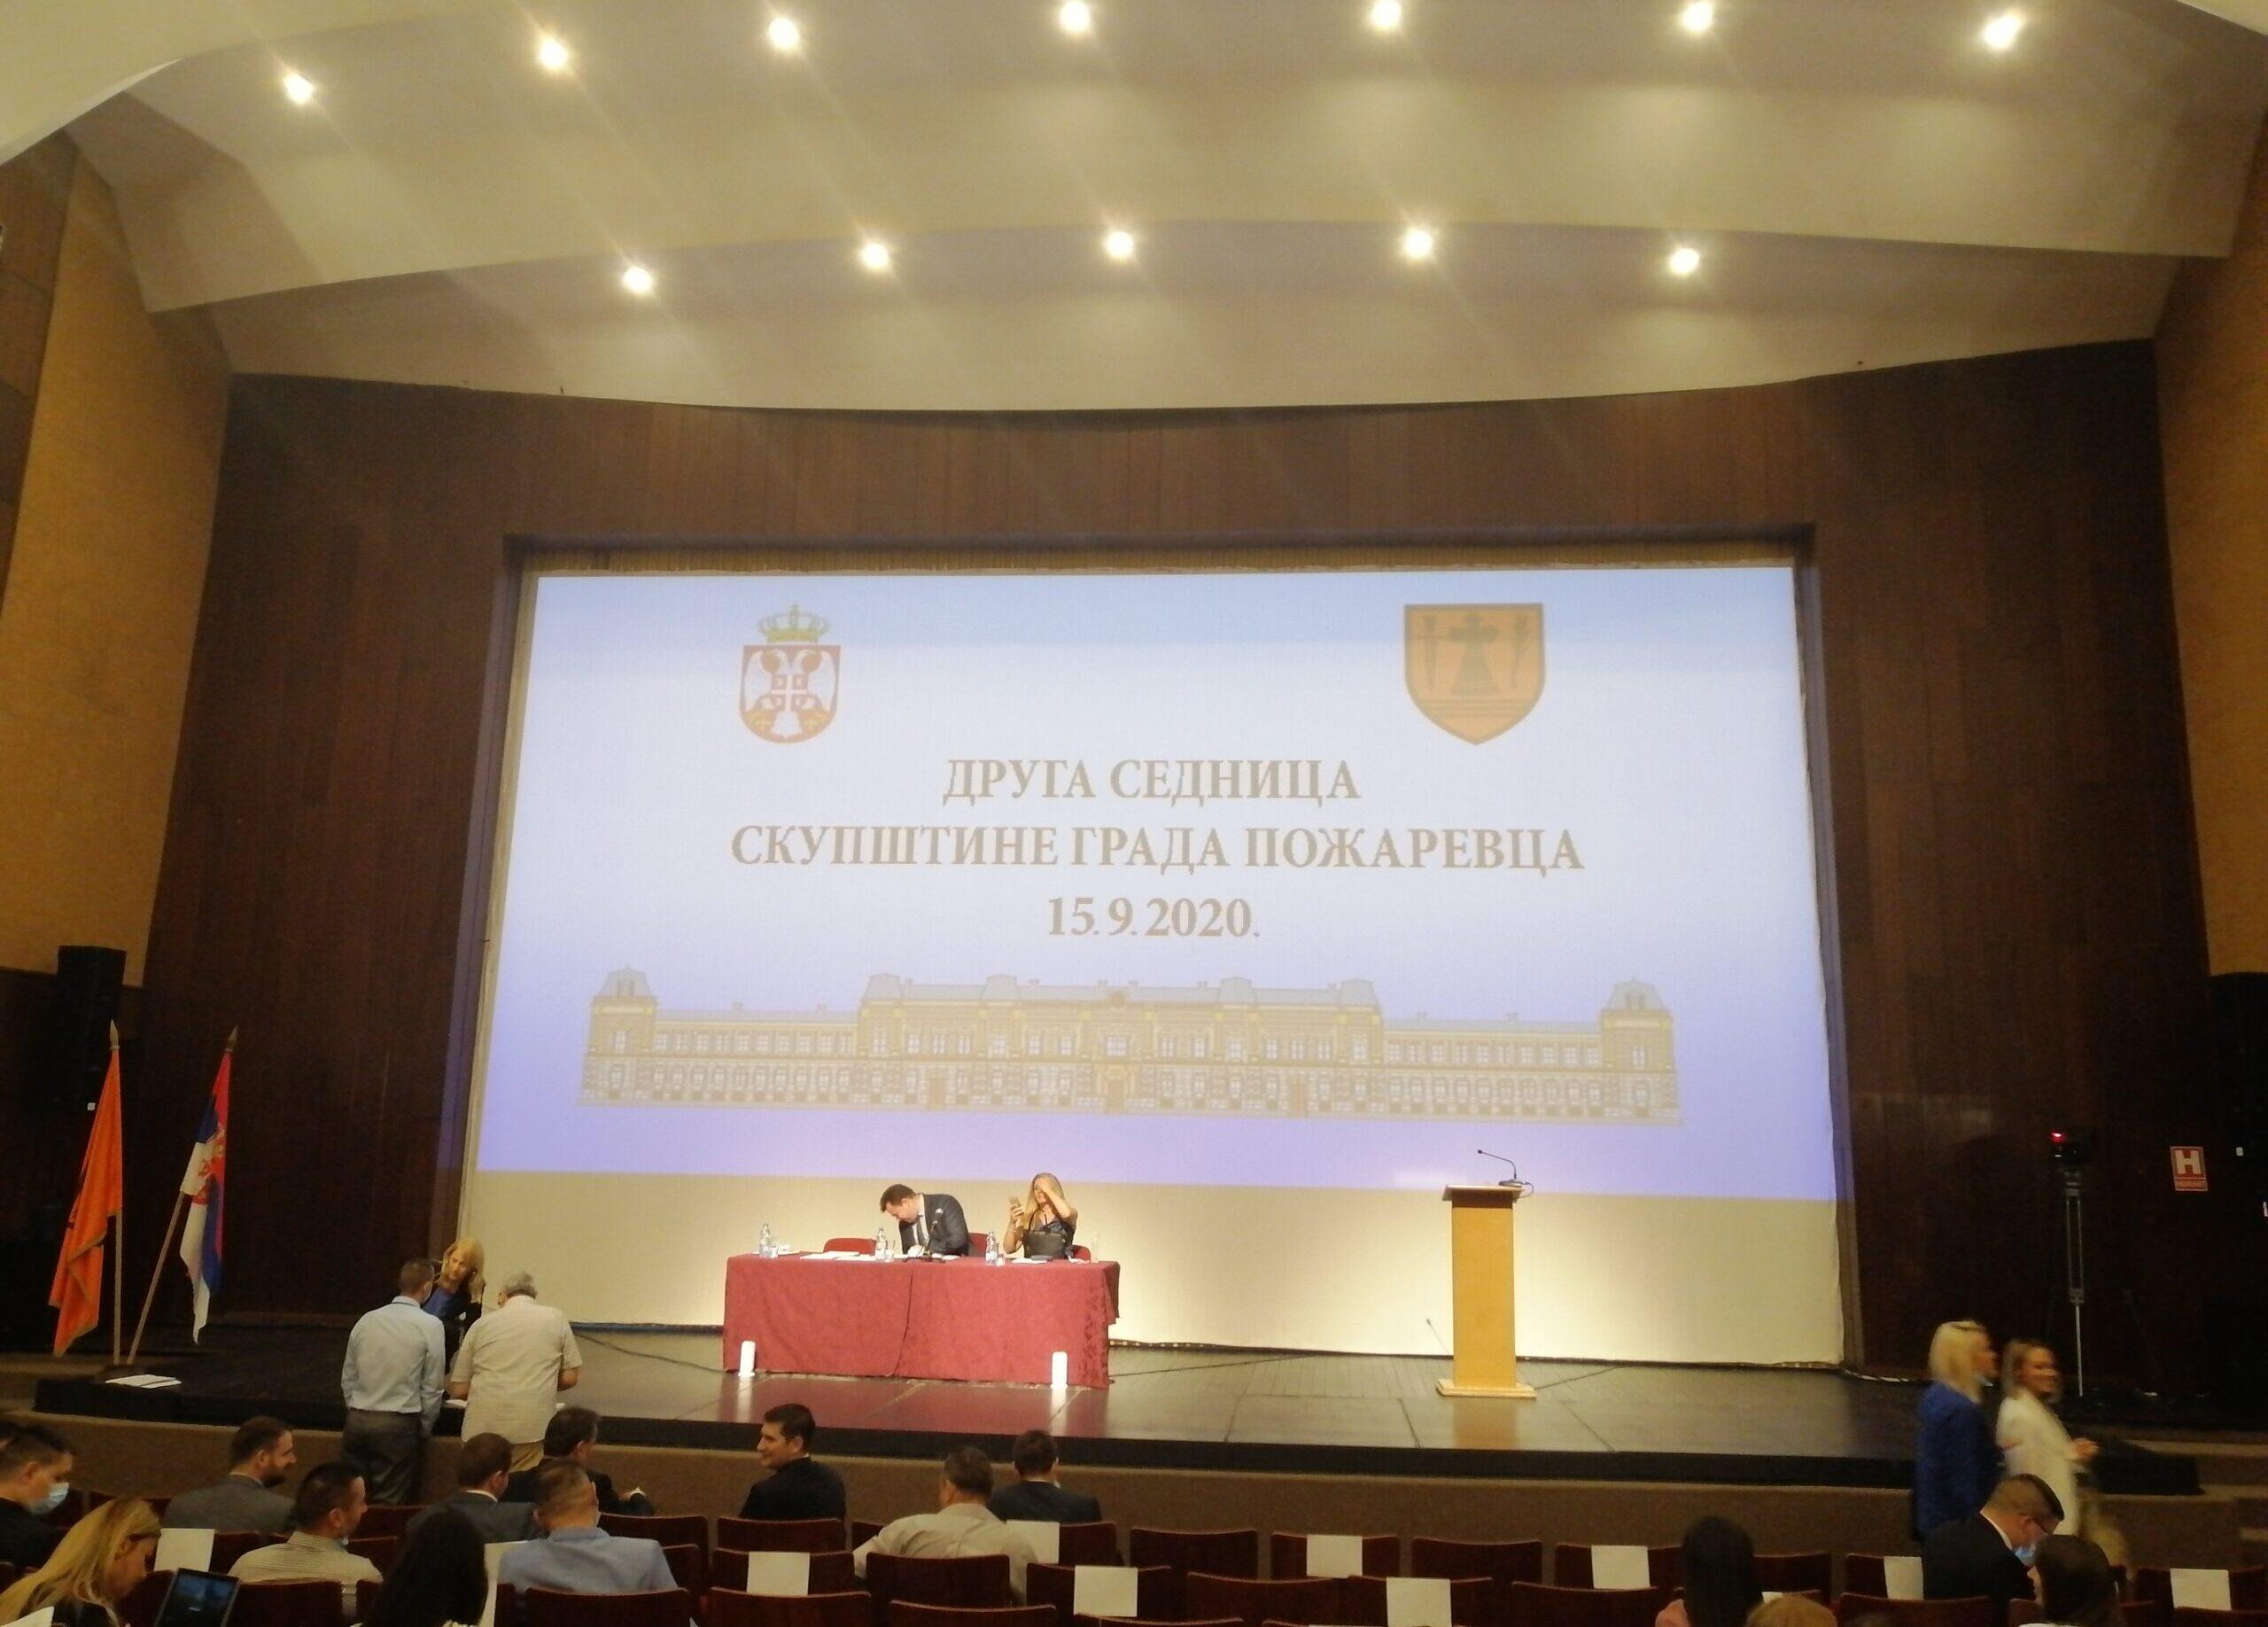 Održana druga sednica Skupštine grada Požarevca 41593